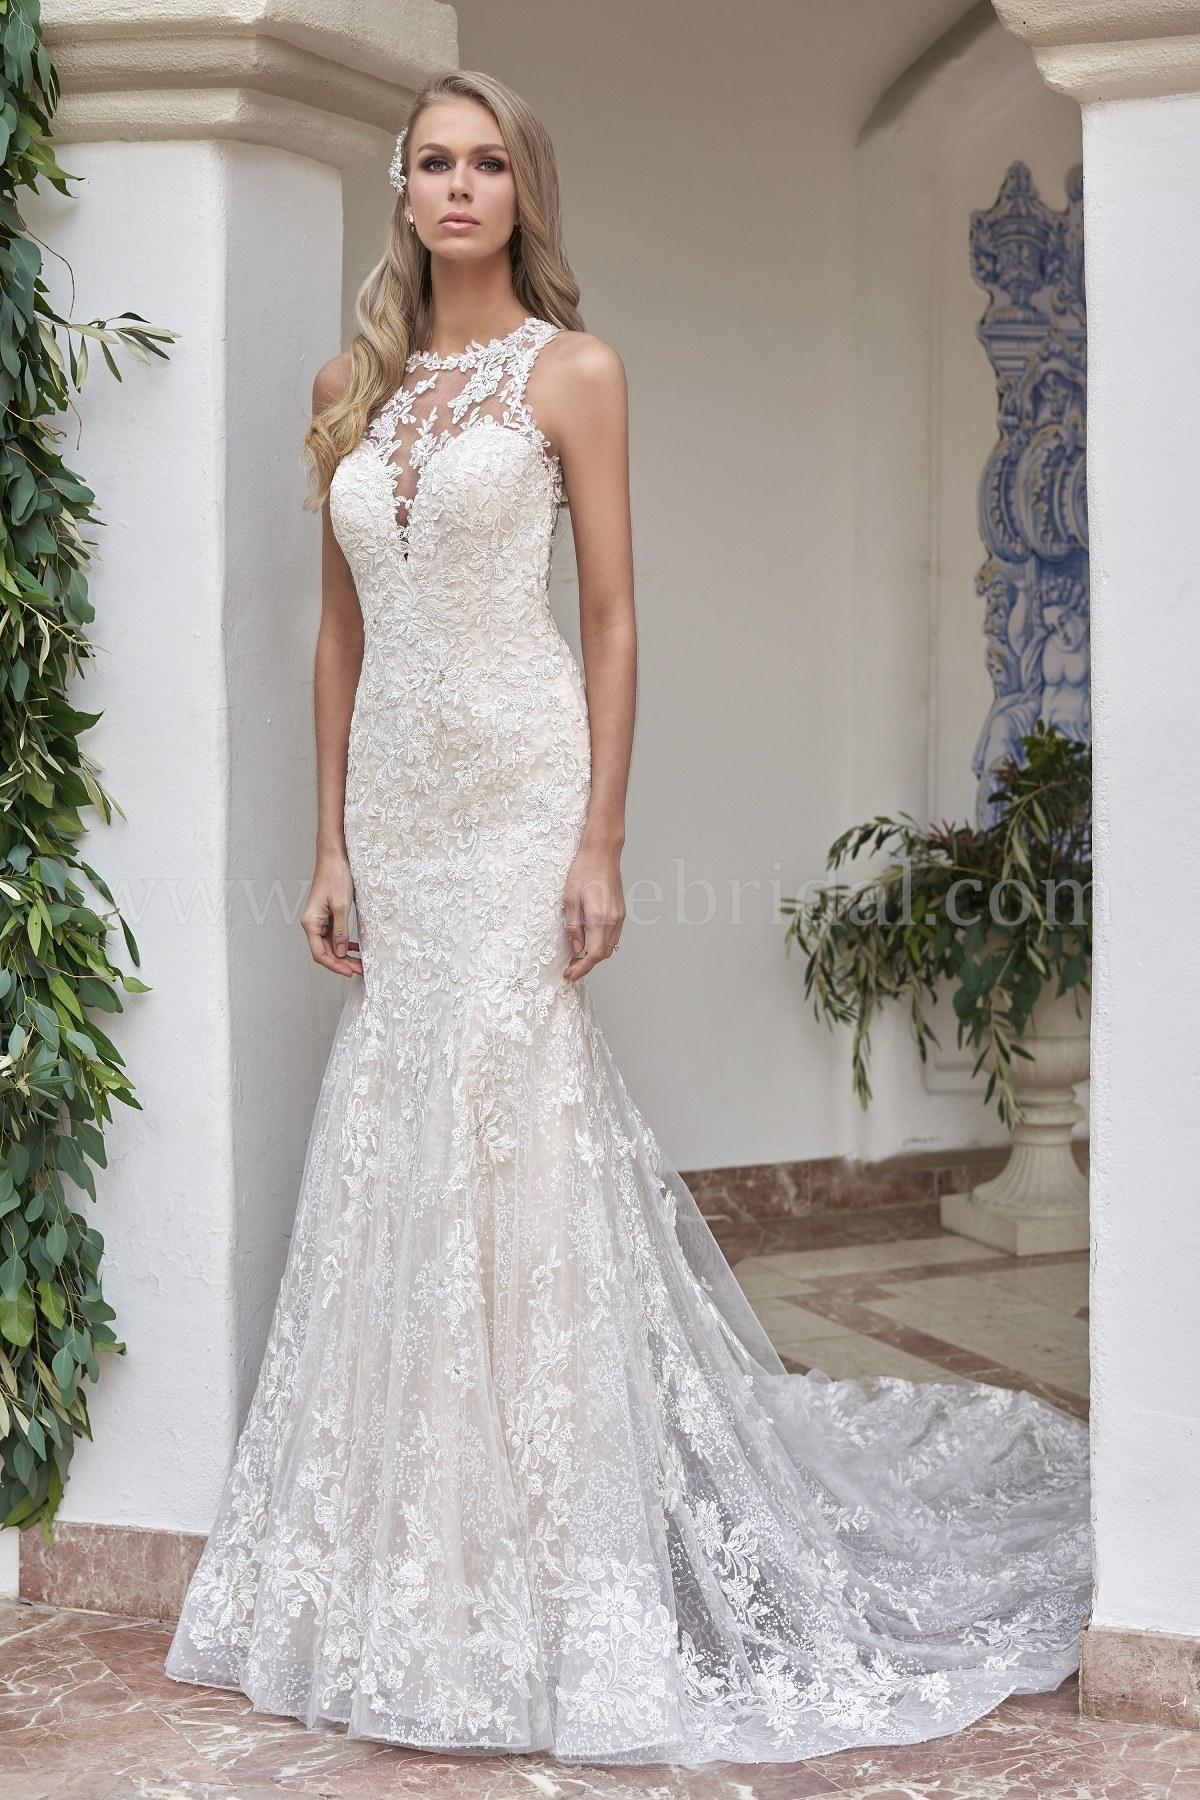 T202053 Illusion Halter Neckline Sequin Lace Tulle Wedding